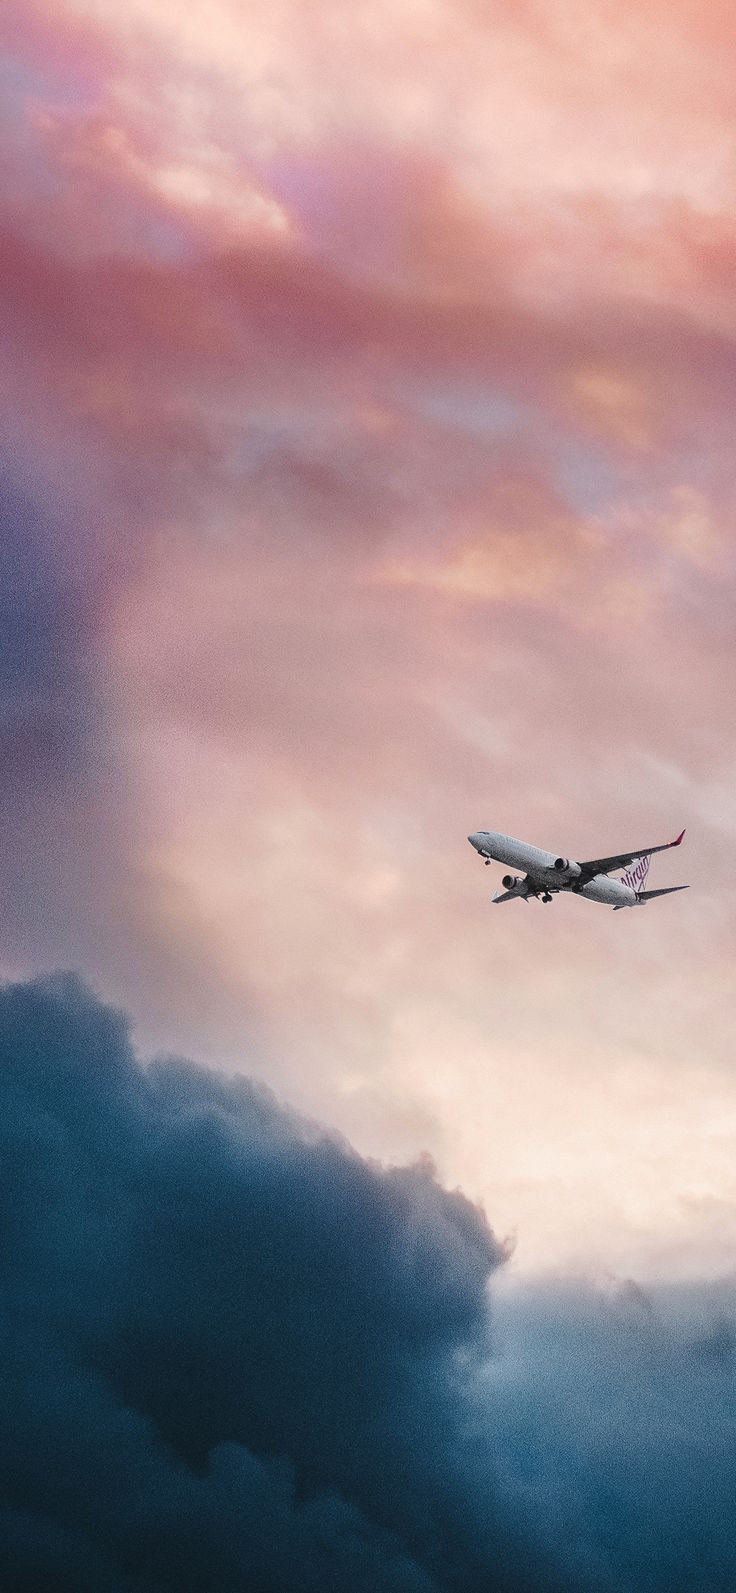 nv09-cloud-plane-fly-sky-nature via iPhoneXpapers.com – Hintergrundbilder für i… – Lucia Klemm